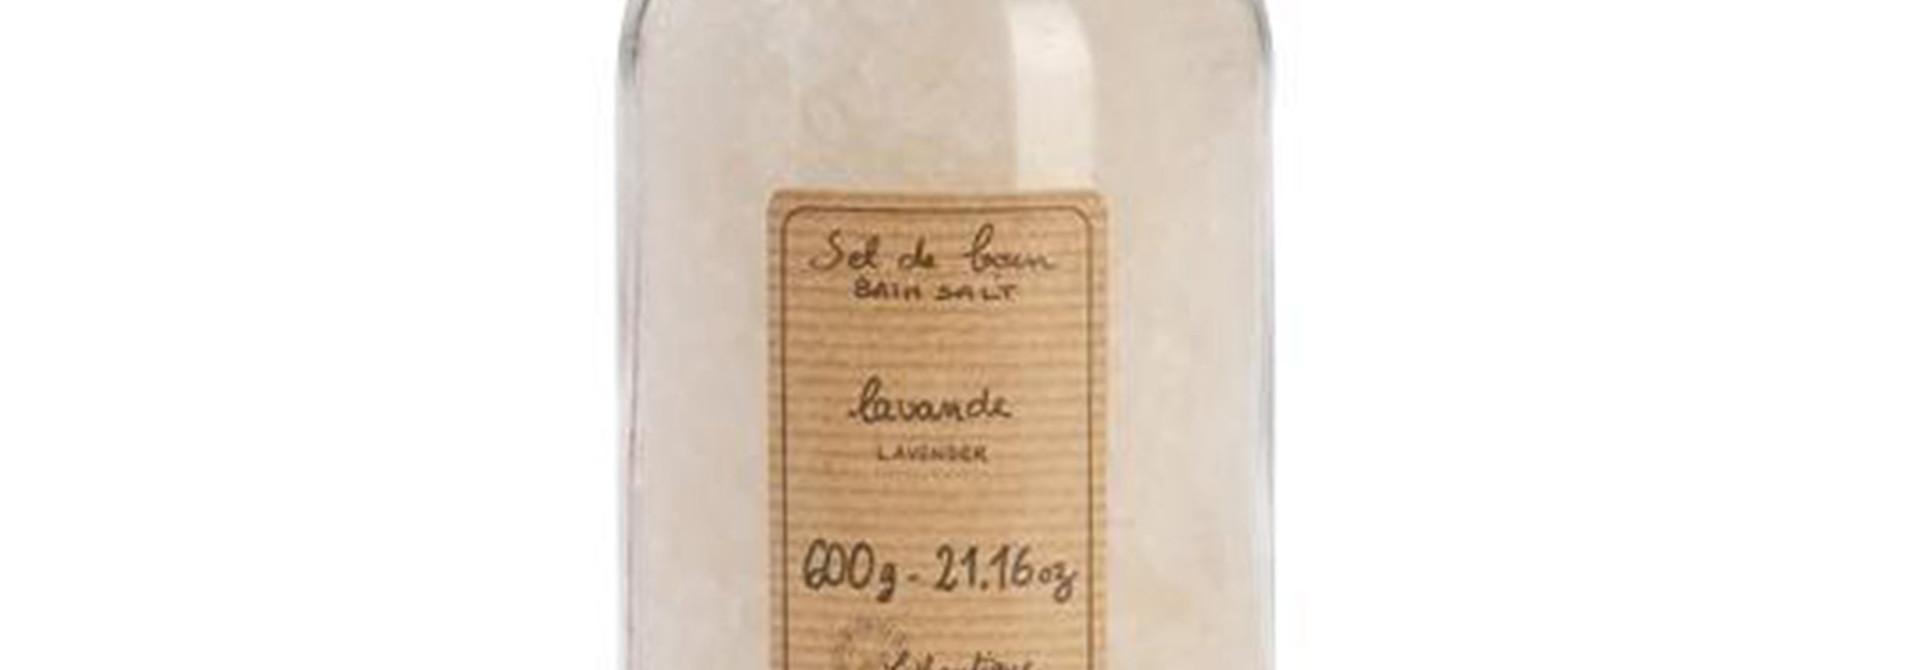 Lavender - 600g Bath Salts